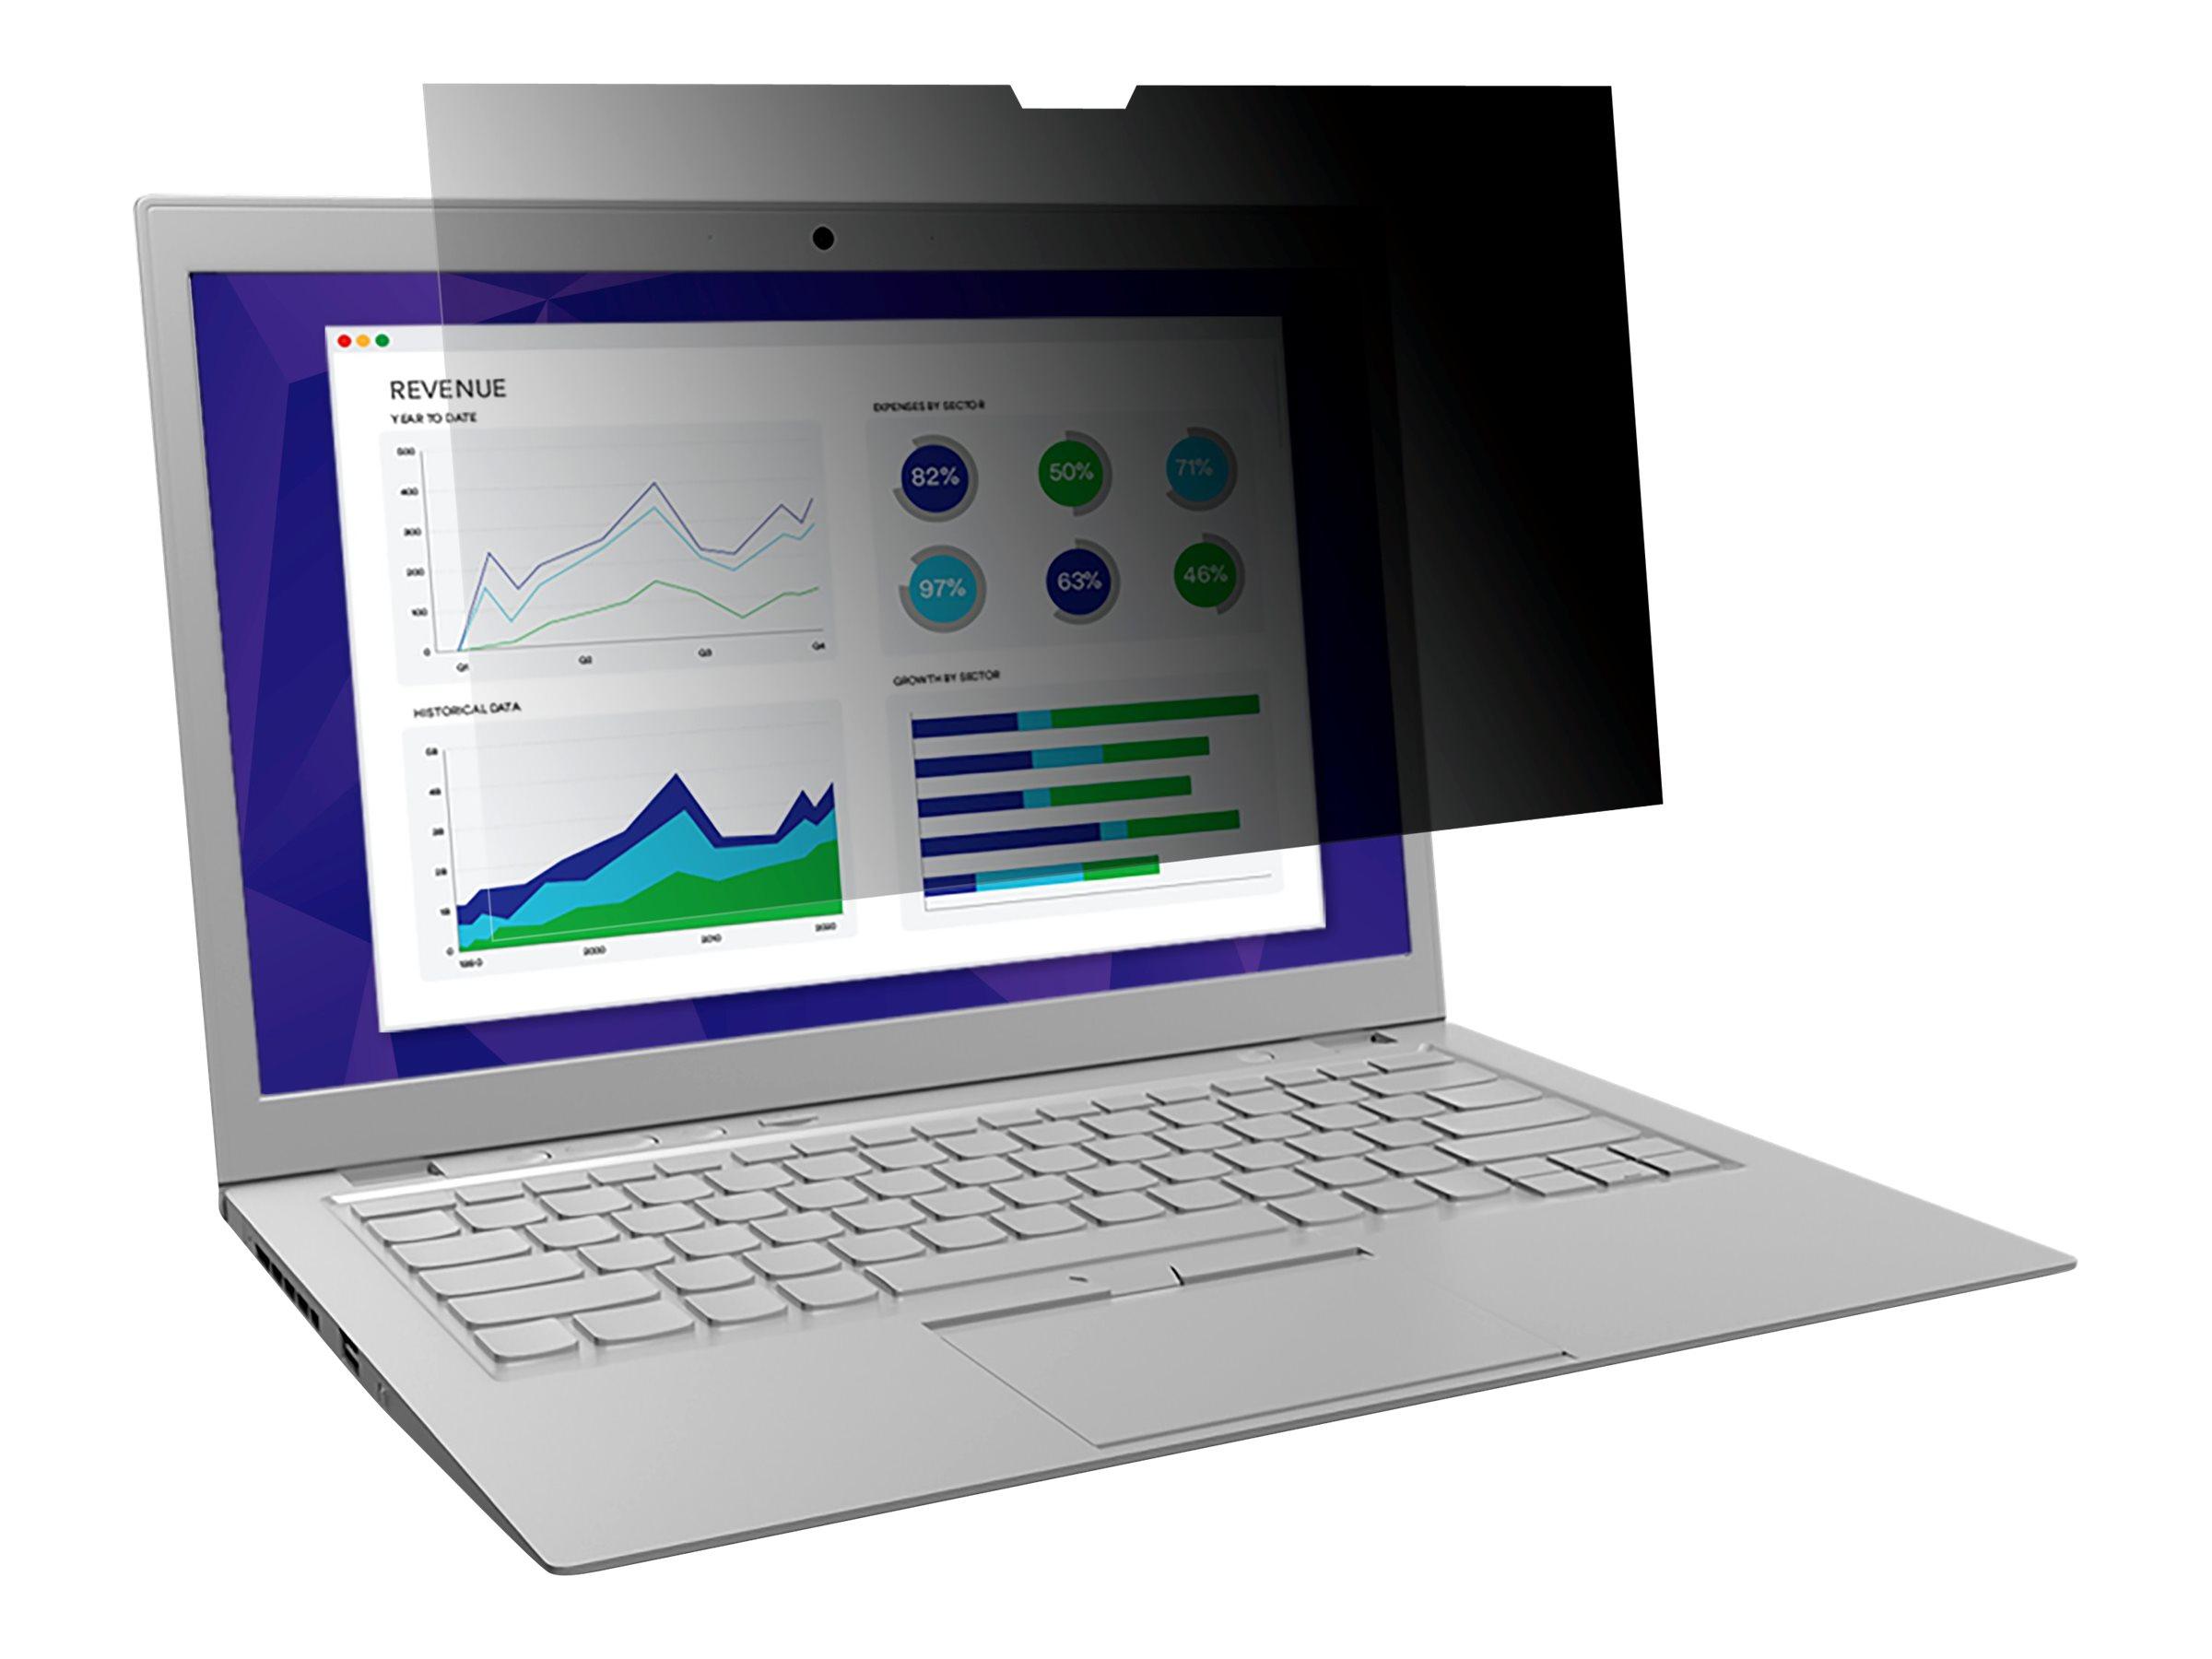 "3M Blickschutzfilter for Dell 13.3"" Infinity Display Laptops with COMPLY Attachment System - Blickschutzfilter für Notebook - 33,8 cm Breitbild (13,3 Zoll Breitbild)"